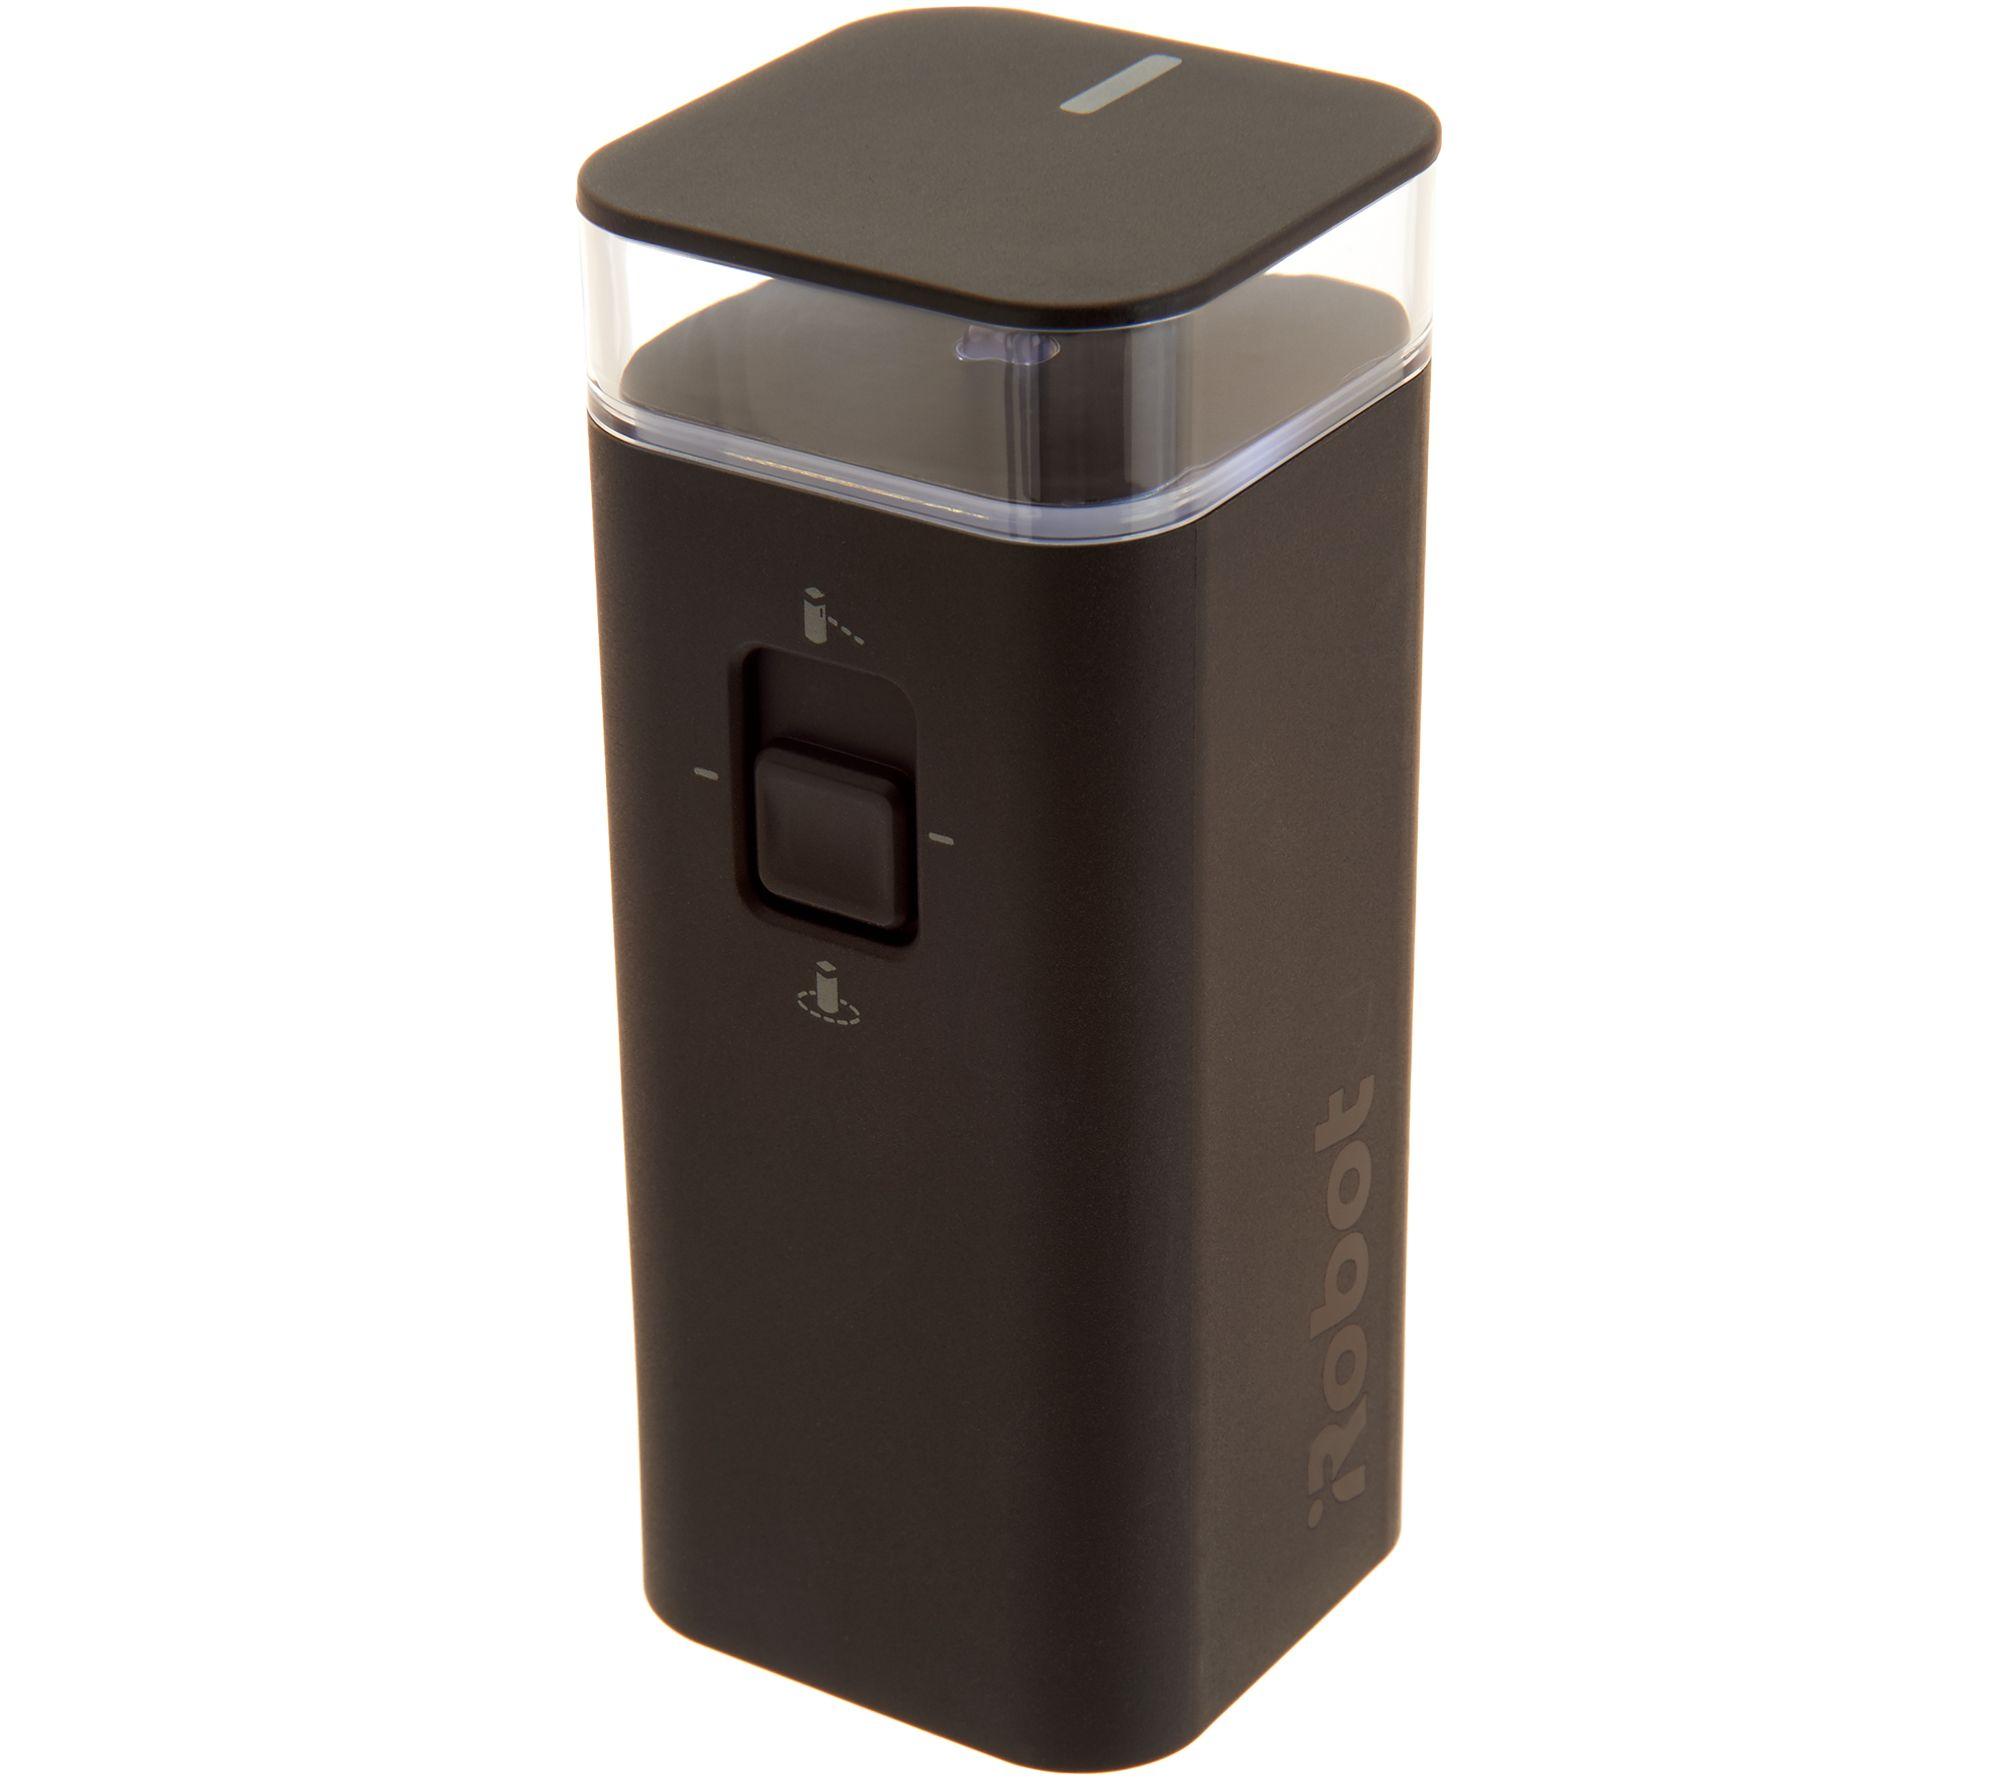 iRobot Roomba 690 Wi-Fi Connect Robotic Vacuum & Accessory Kit — QVC com